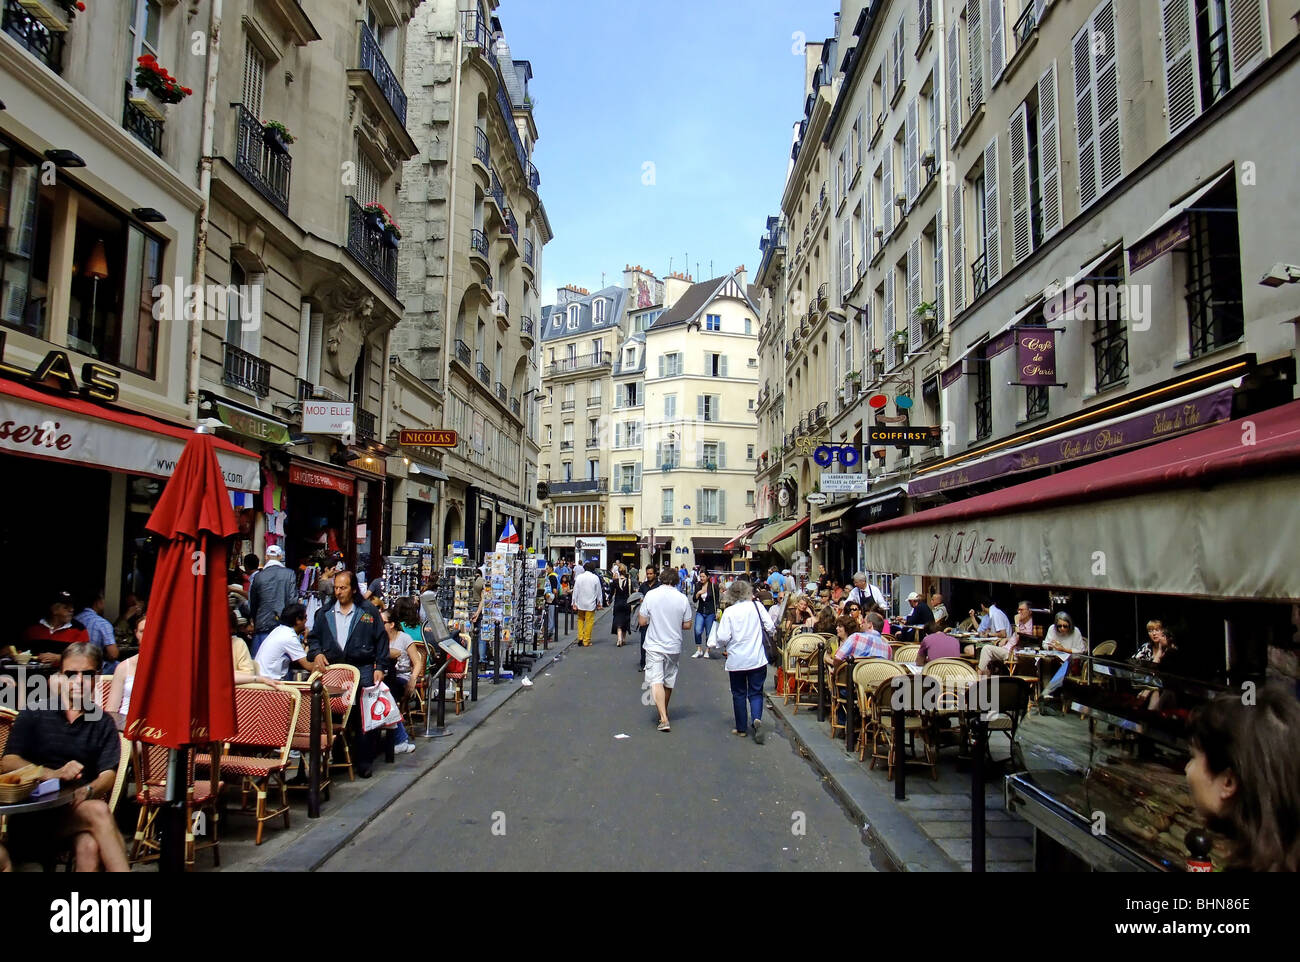 Cafe De Paris St Martin